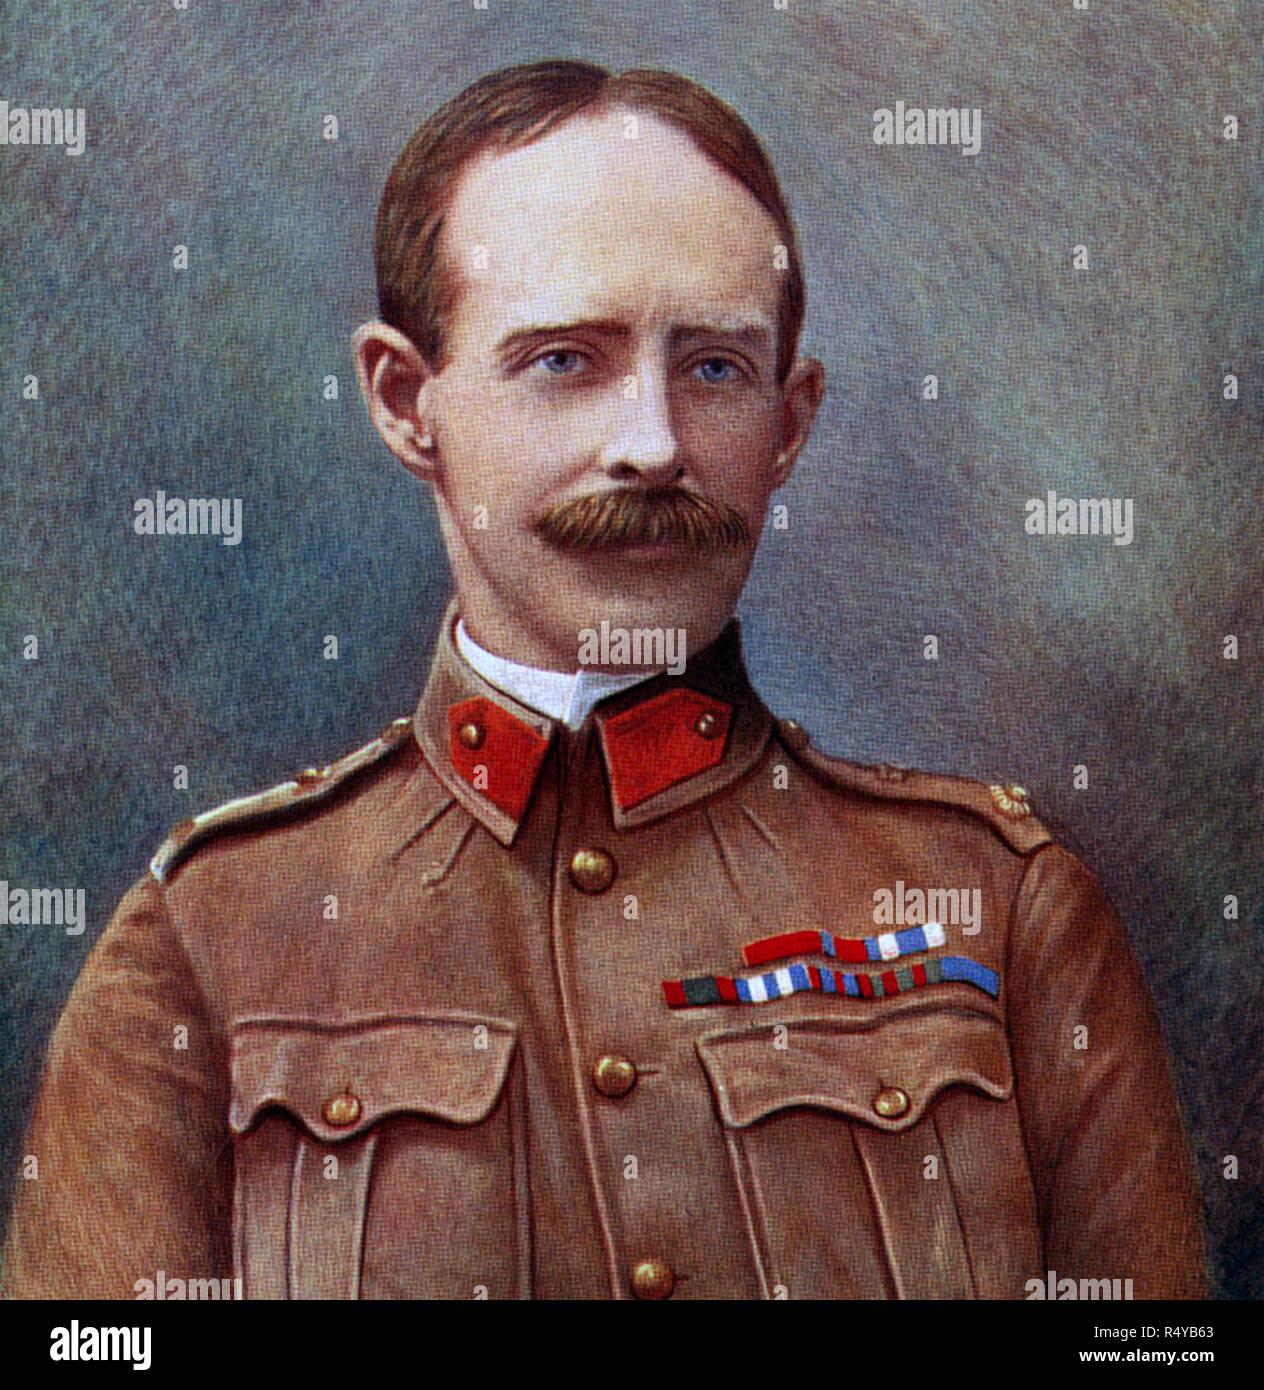 IAN HAMILTON (1853-1947) Senior British Army officer about 1900 - Stock Image